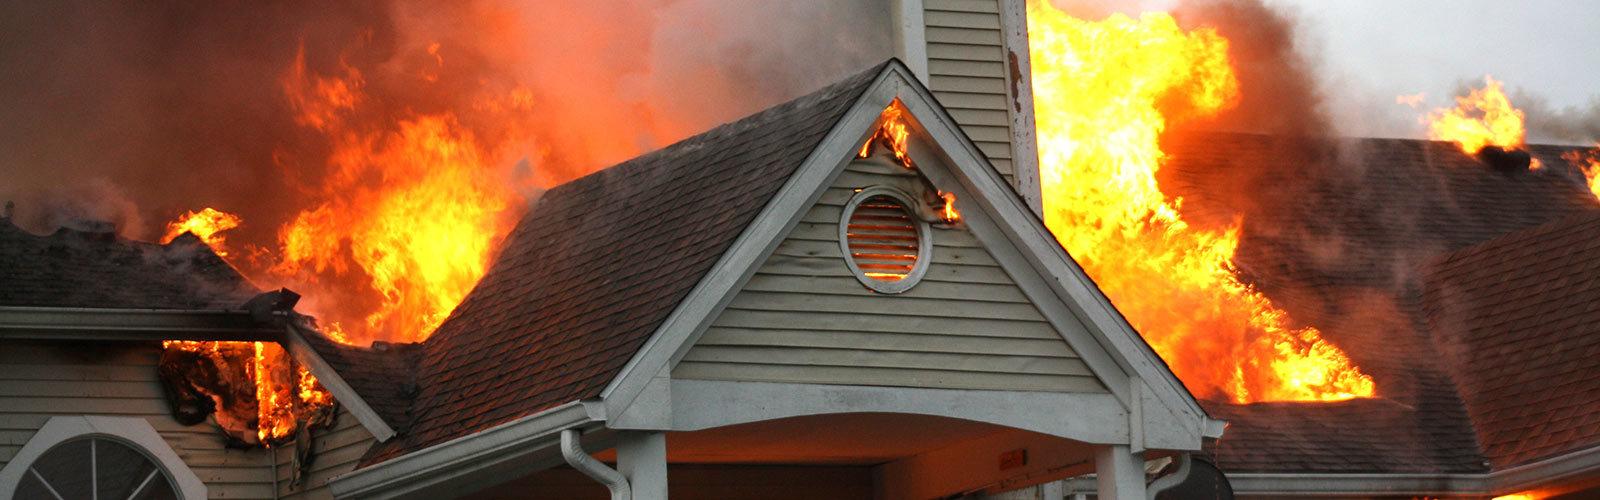 Dwelling/Fire Insurance